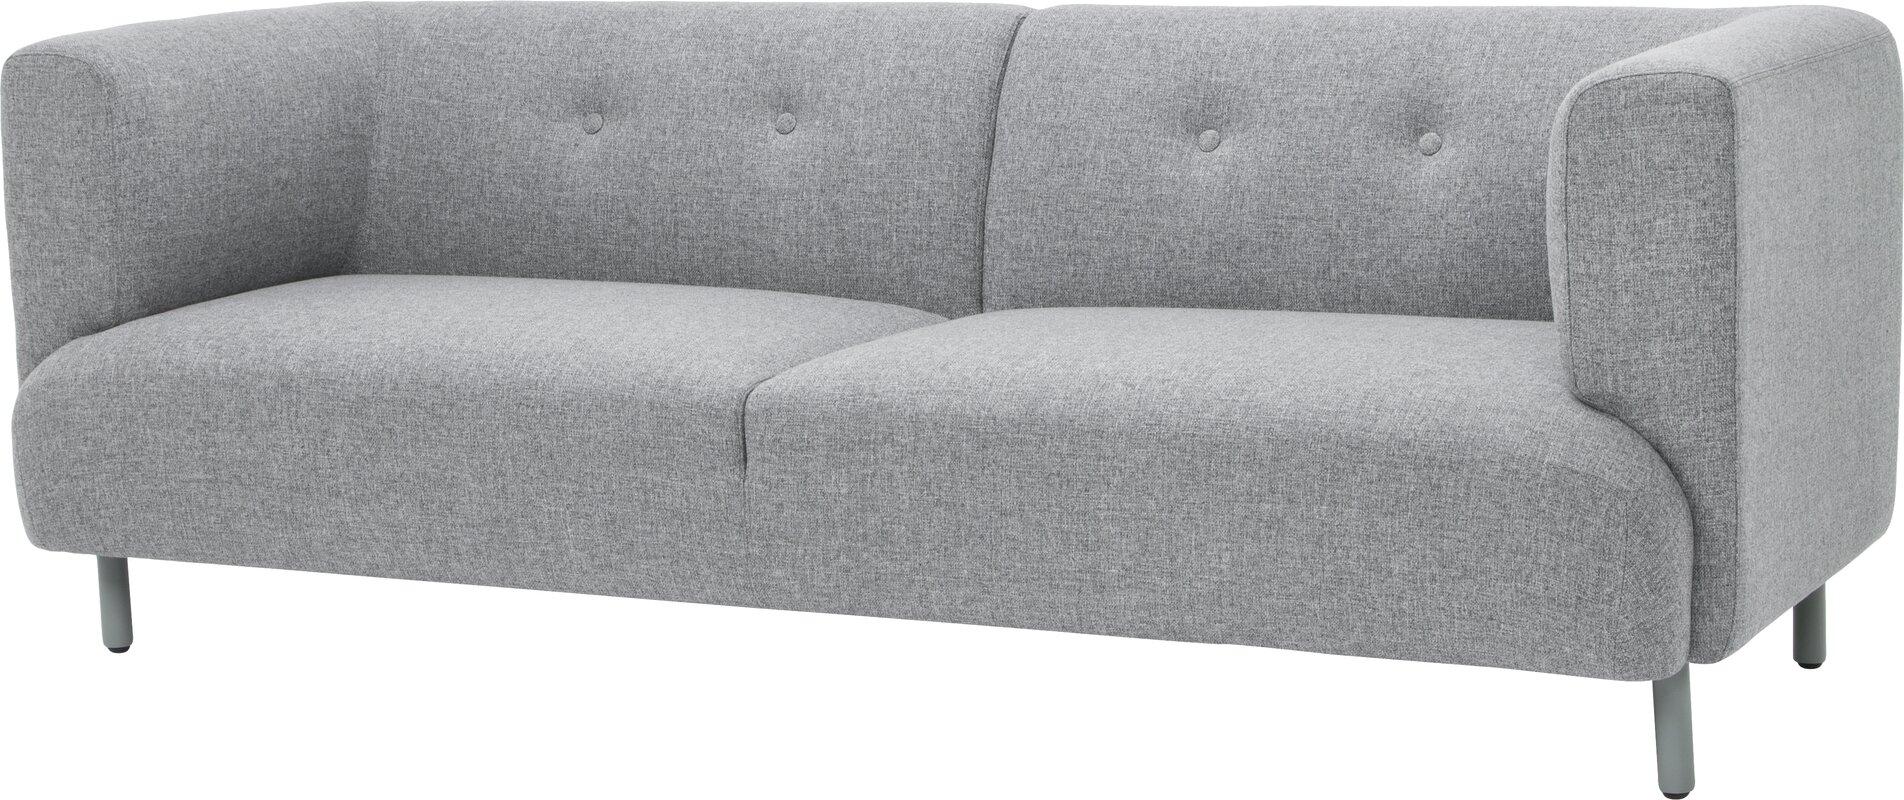 wade logan bakos classic modern chesterfield sofa  reviews  wayfair - defaultname